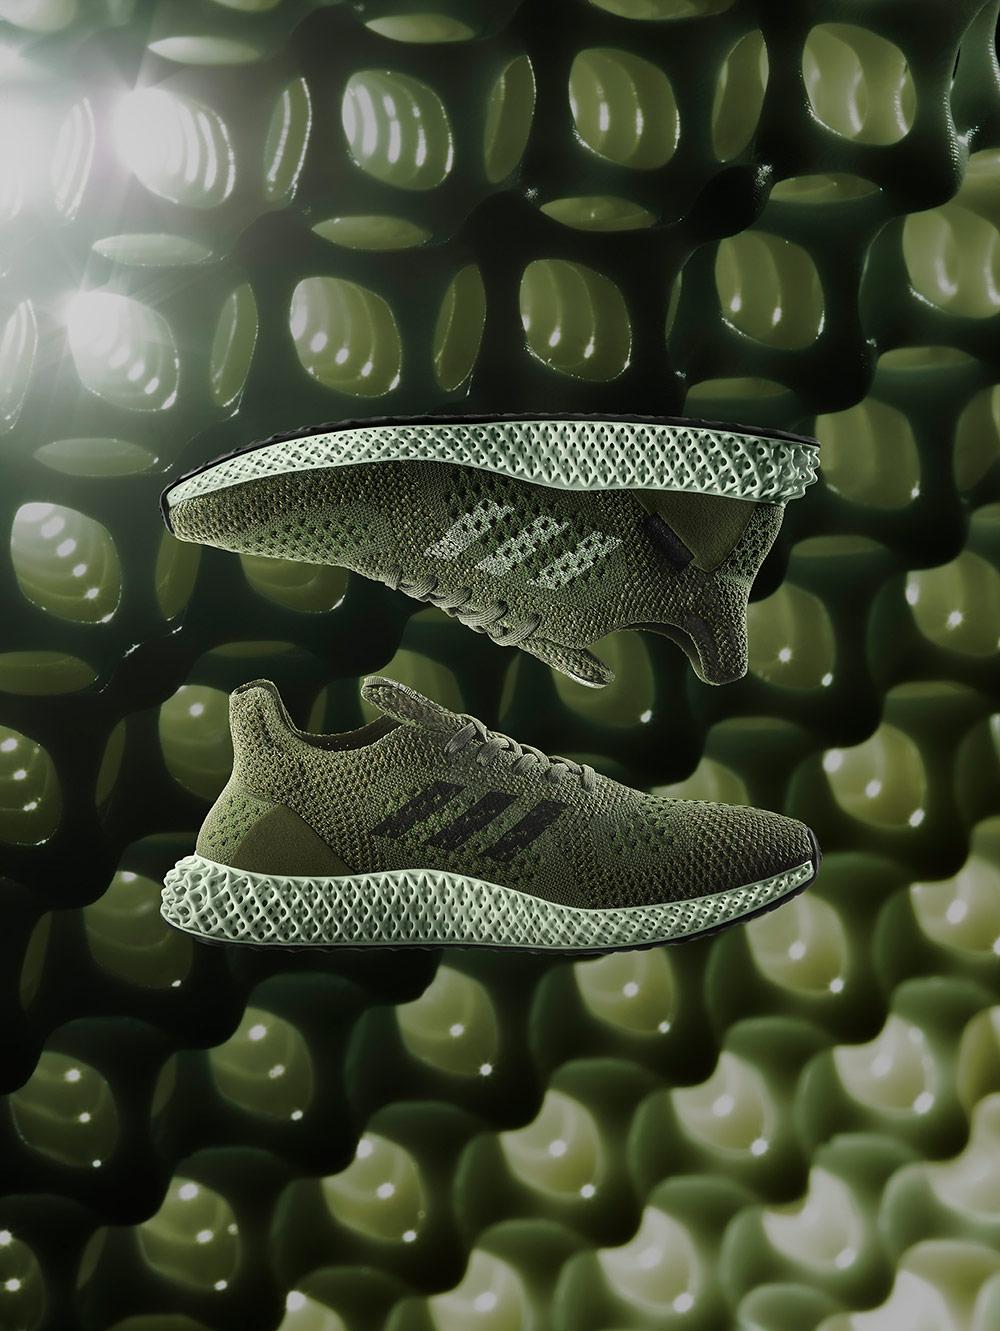 adidas-Originals-Consortium-4D-Footpatrol-2.jpg